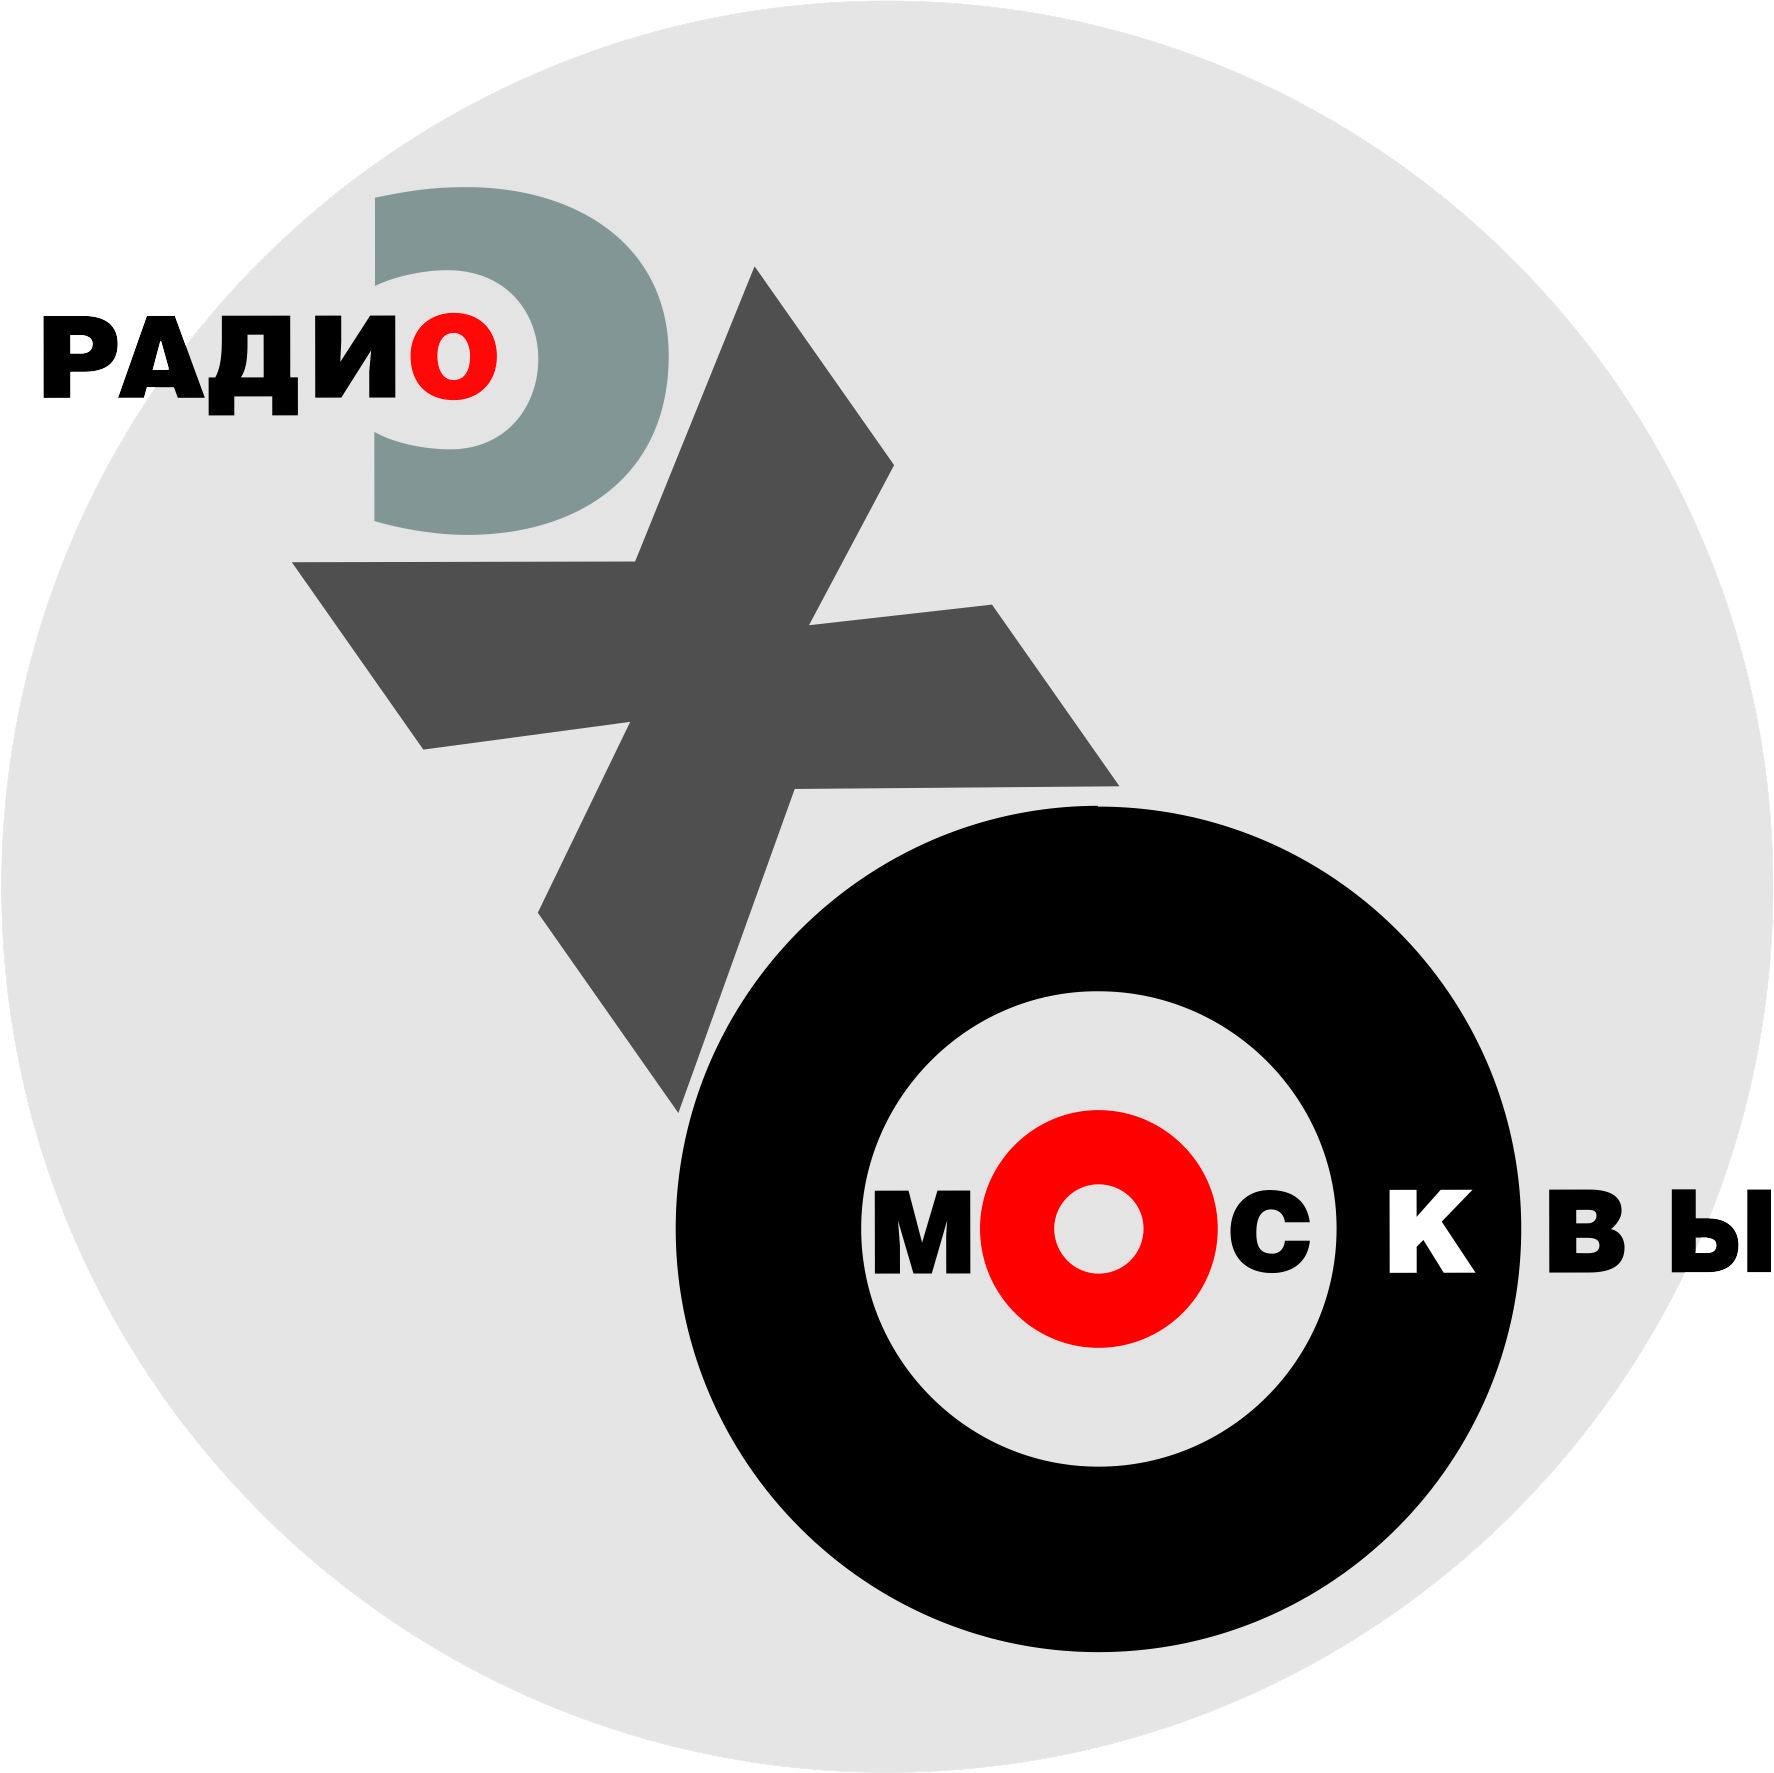 Дизайн логотипа р/с Эхо Москвы. фото f_1735623e737299ec.jpg